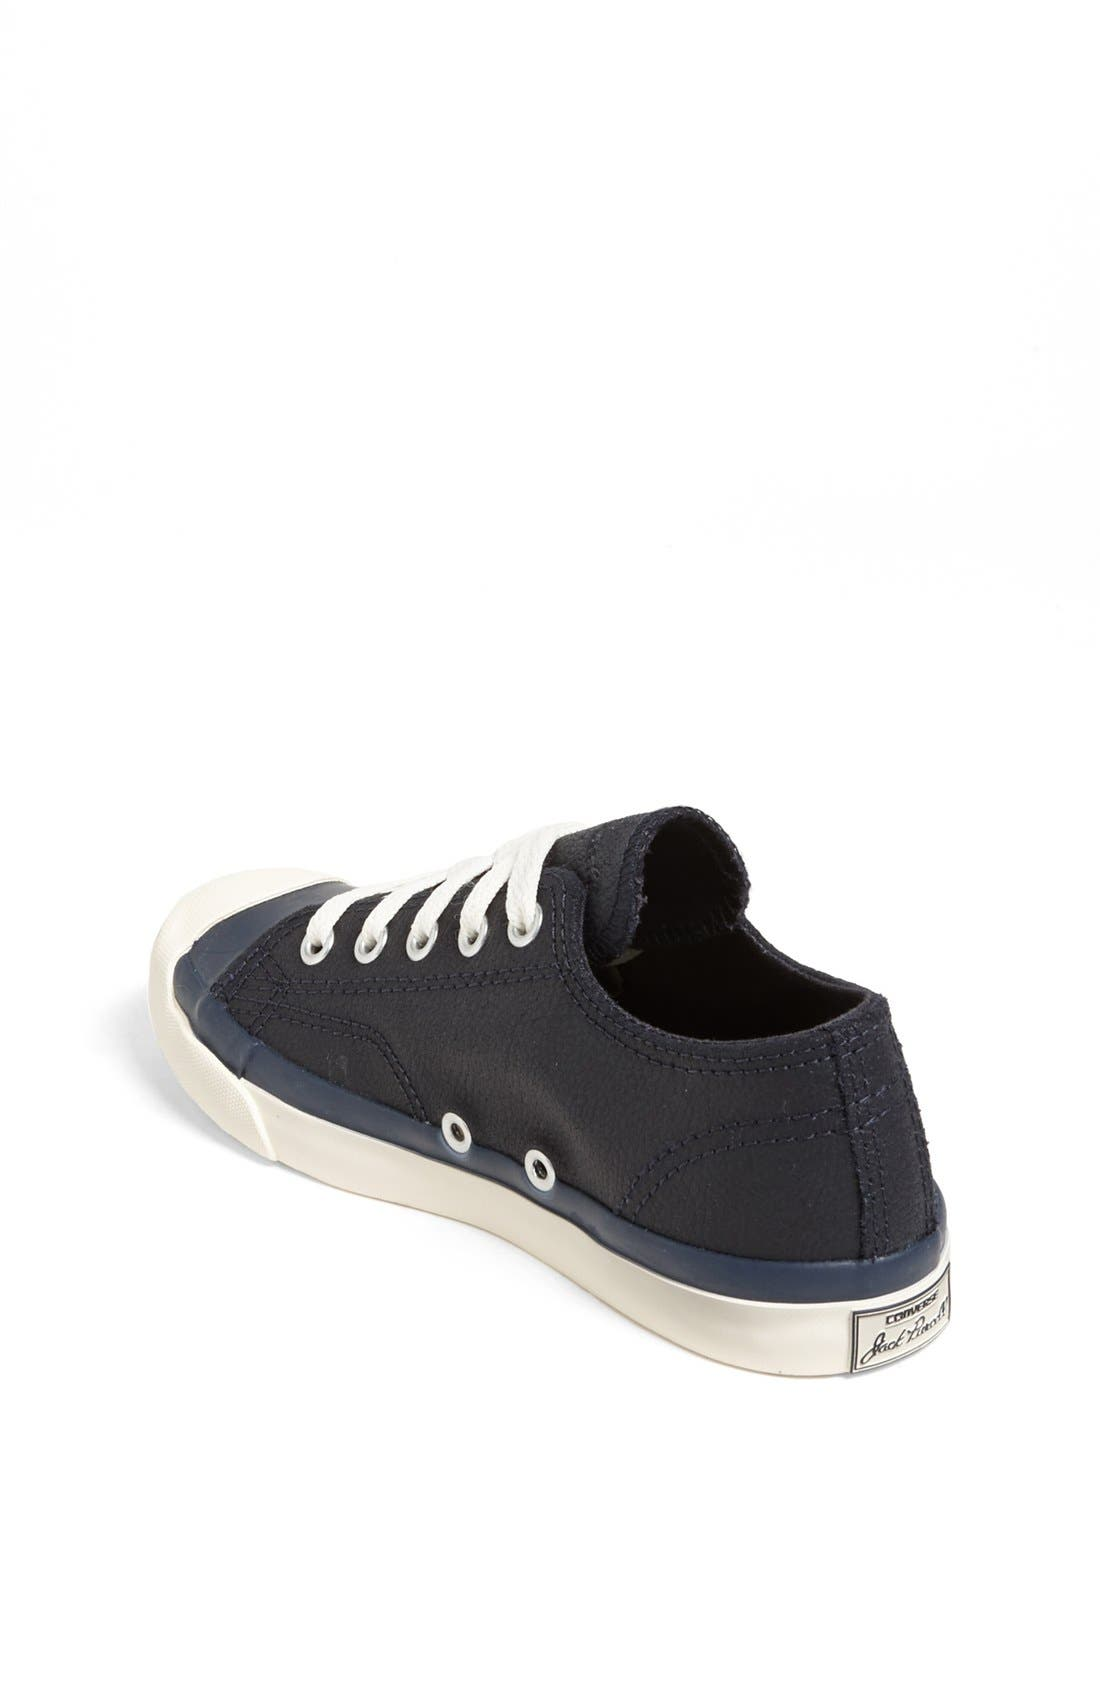 Alternate Image 2  - Converse 'Jack Purcell' Sneaker (Toddler, Little Kid & Big Kid)